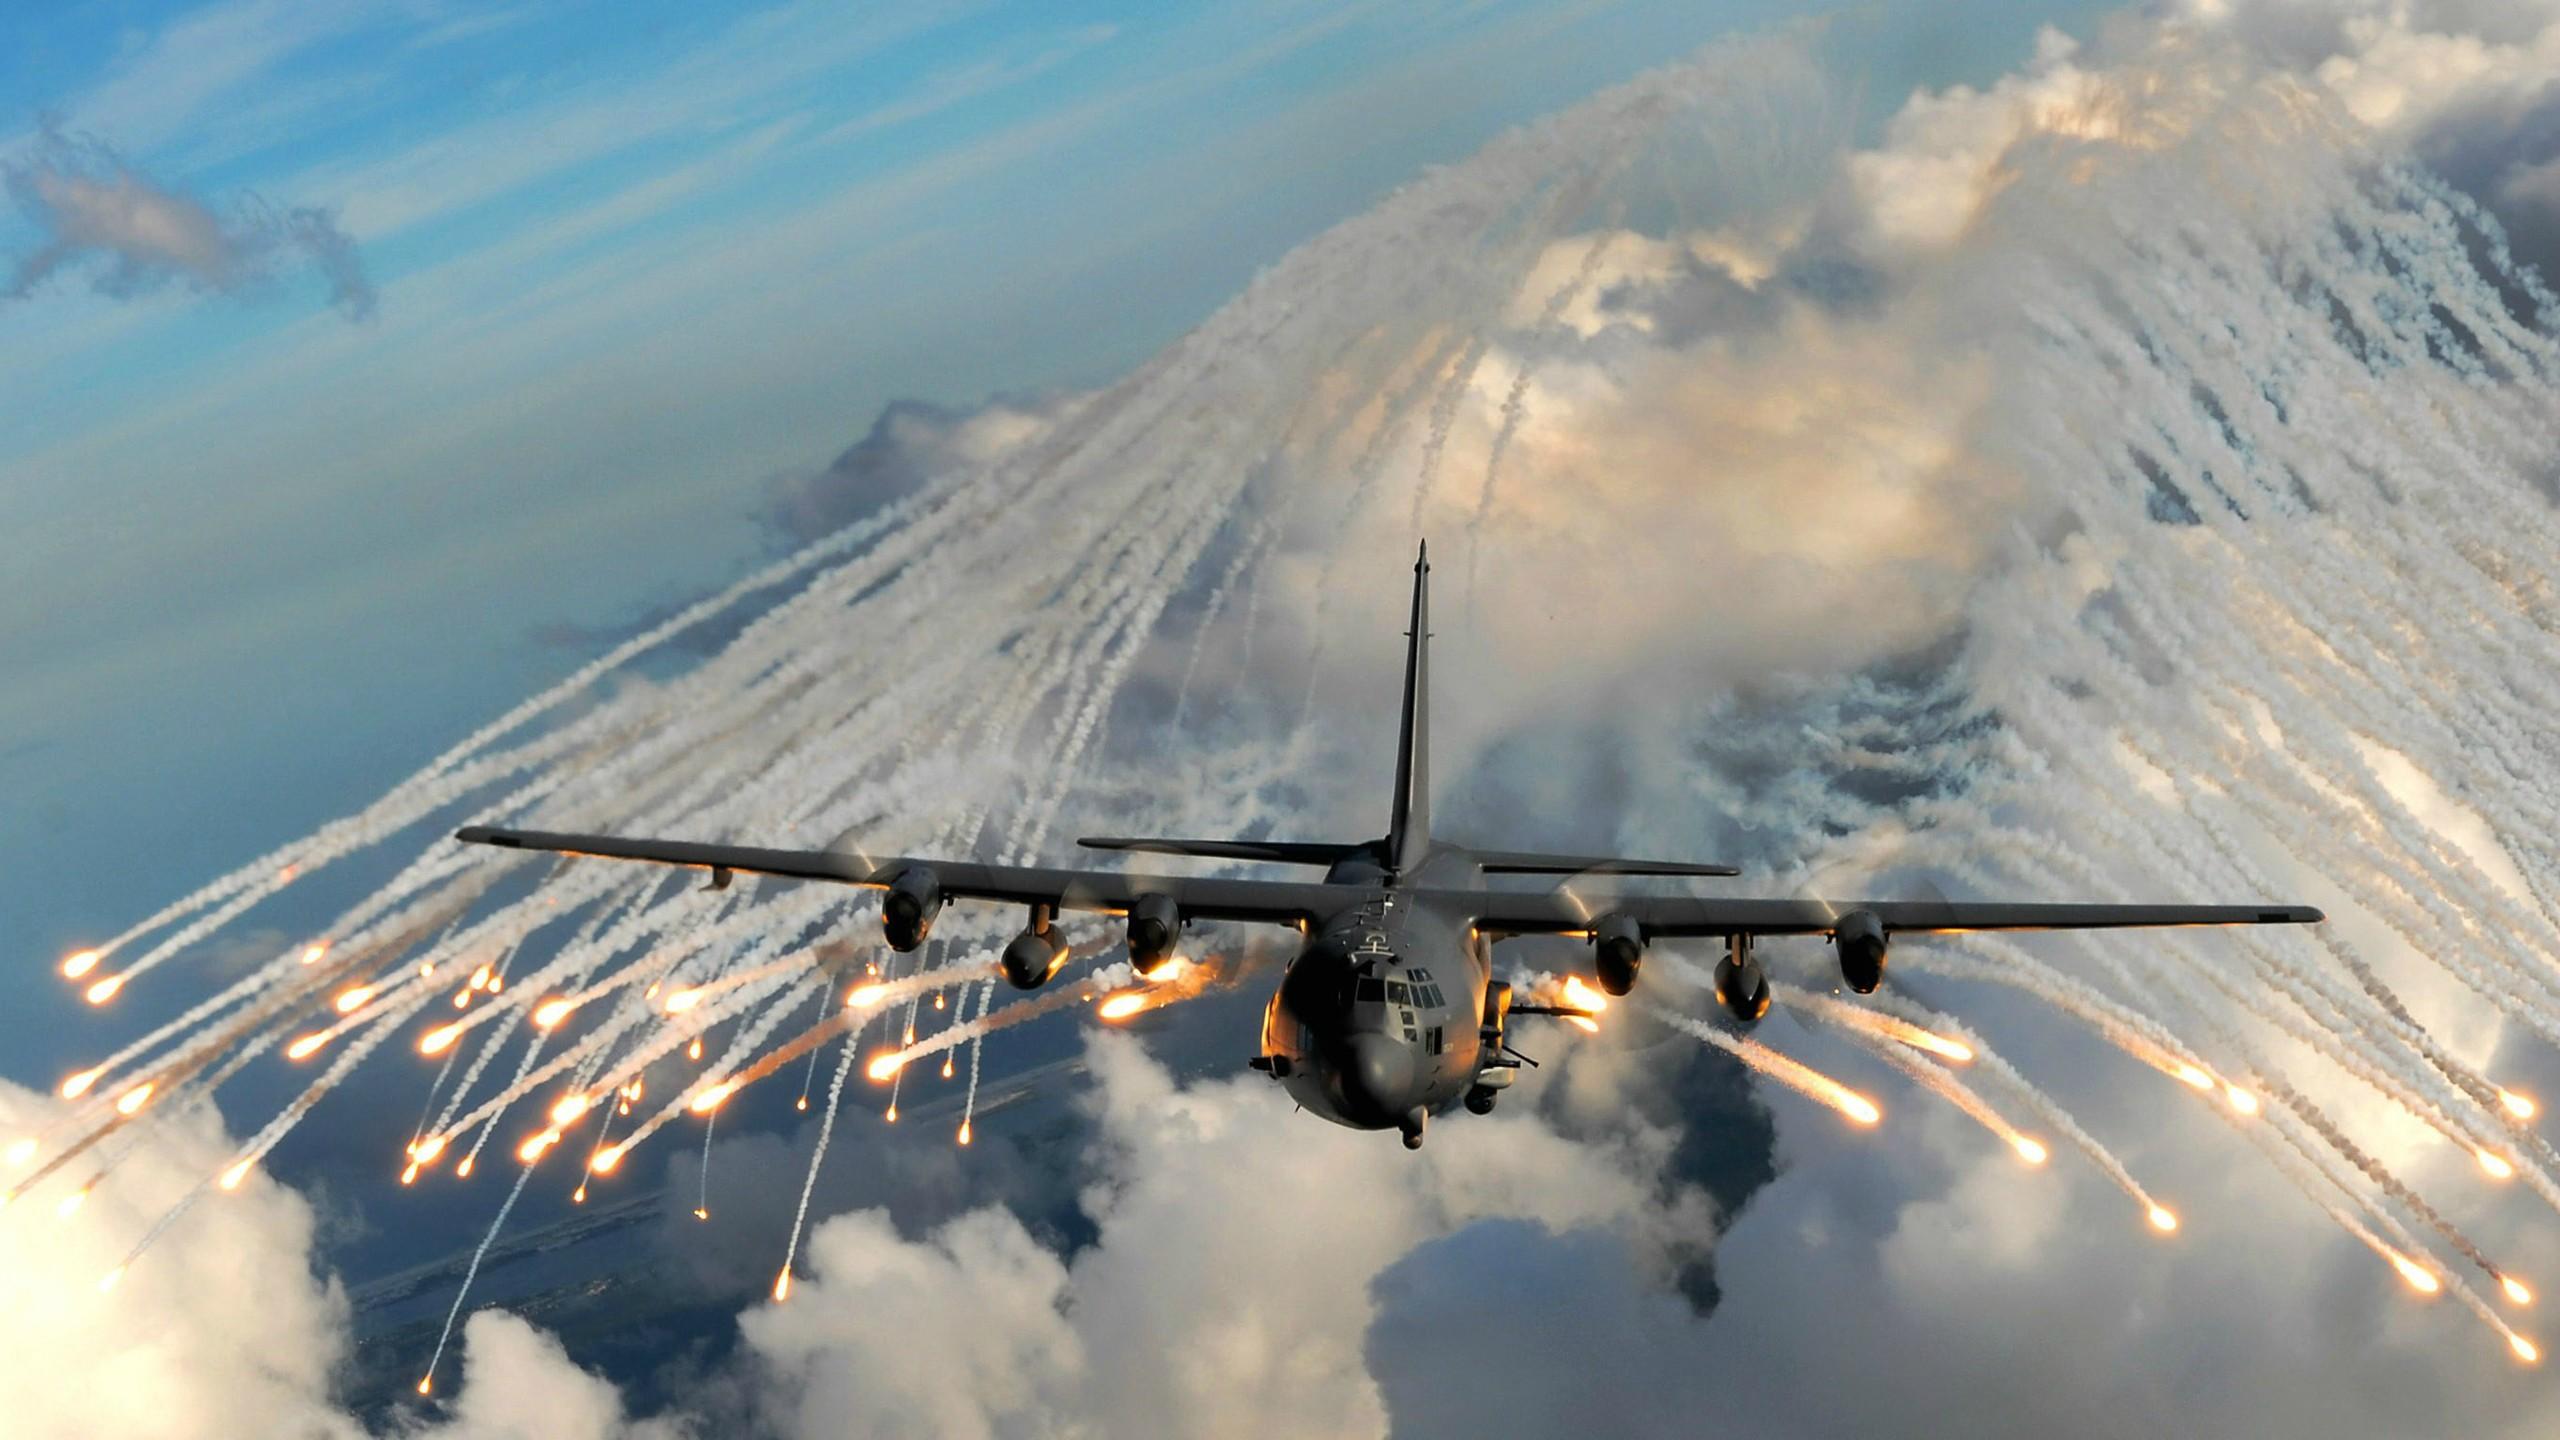 Wallpaper vehicle airplane military aircraft US Air Force 2560x1440